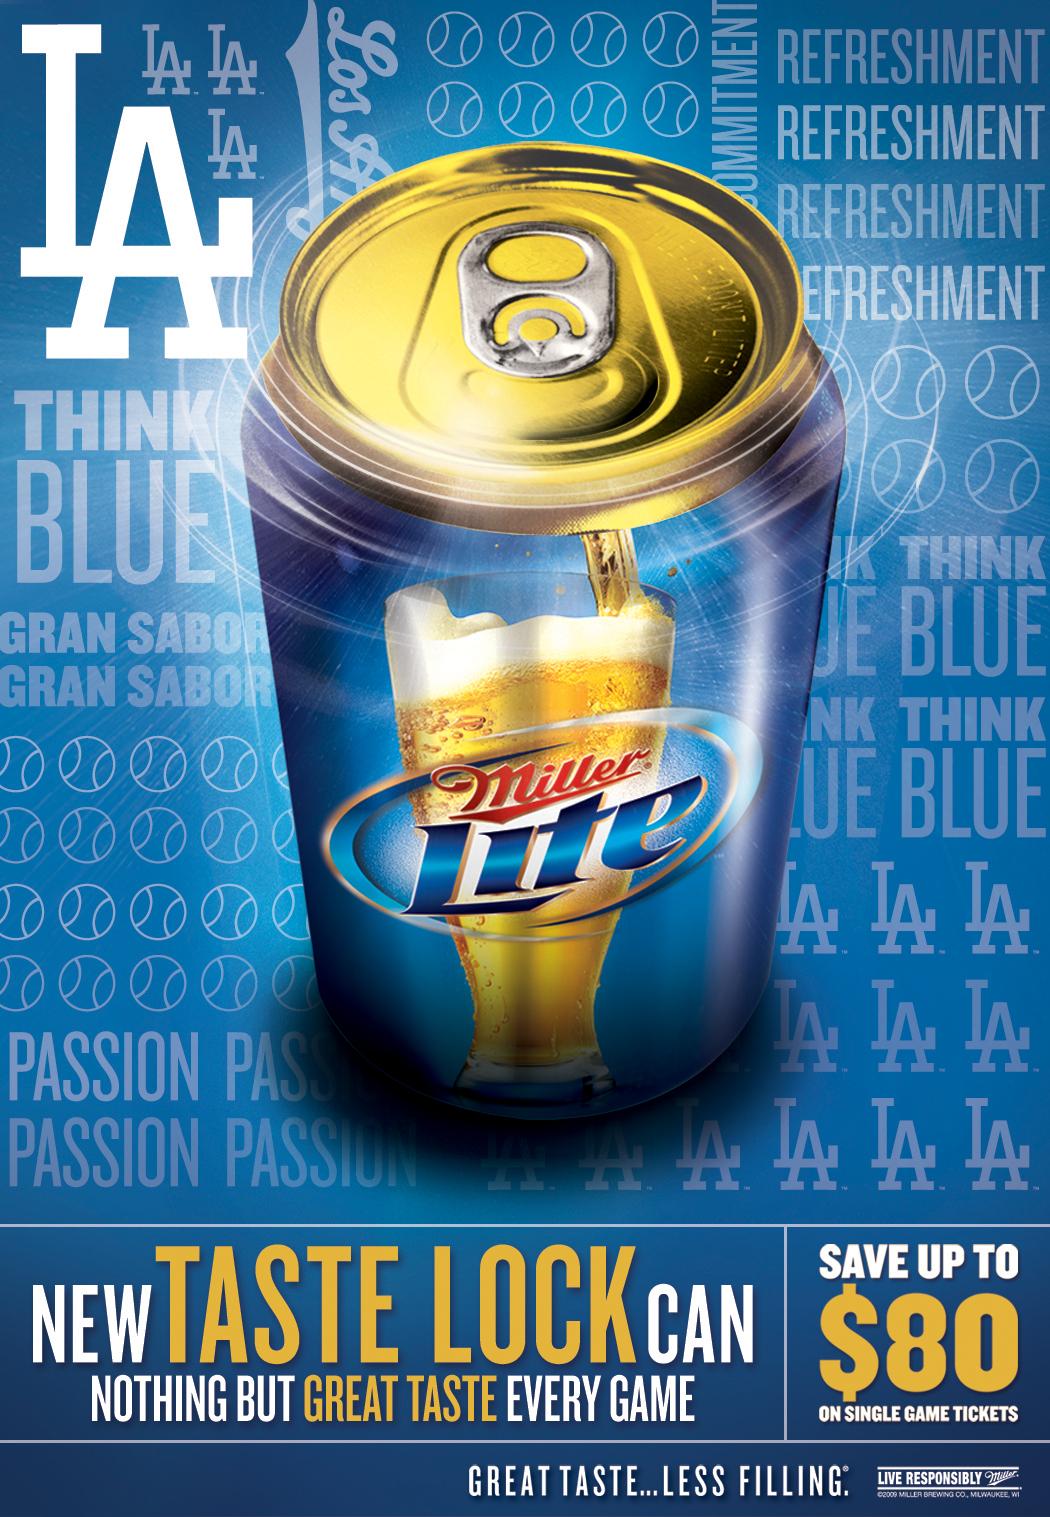 Miller Lite sponsorship in-store and bar signage